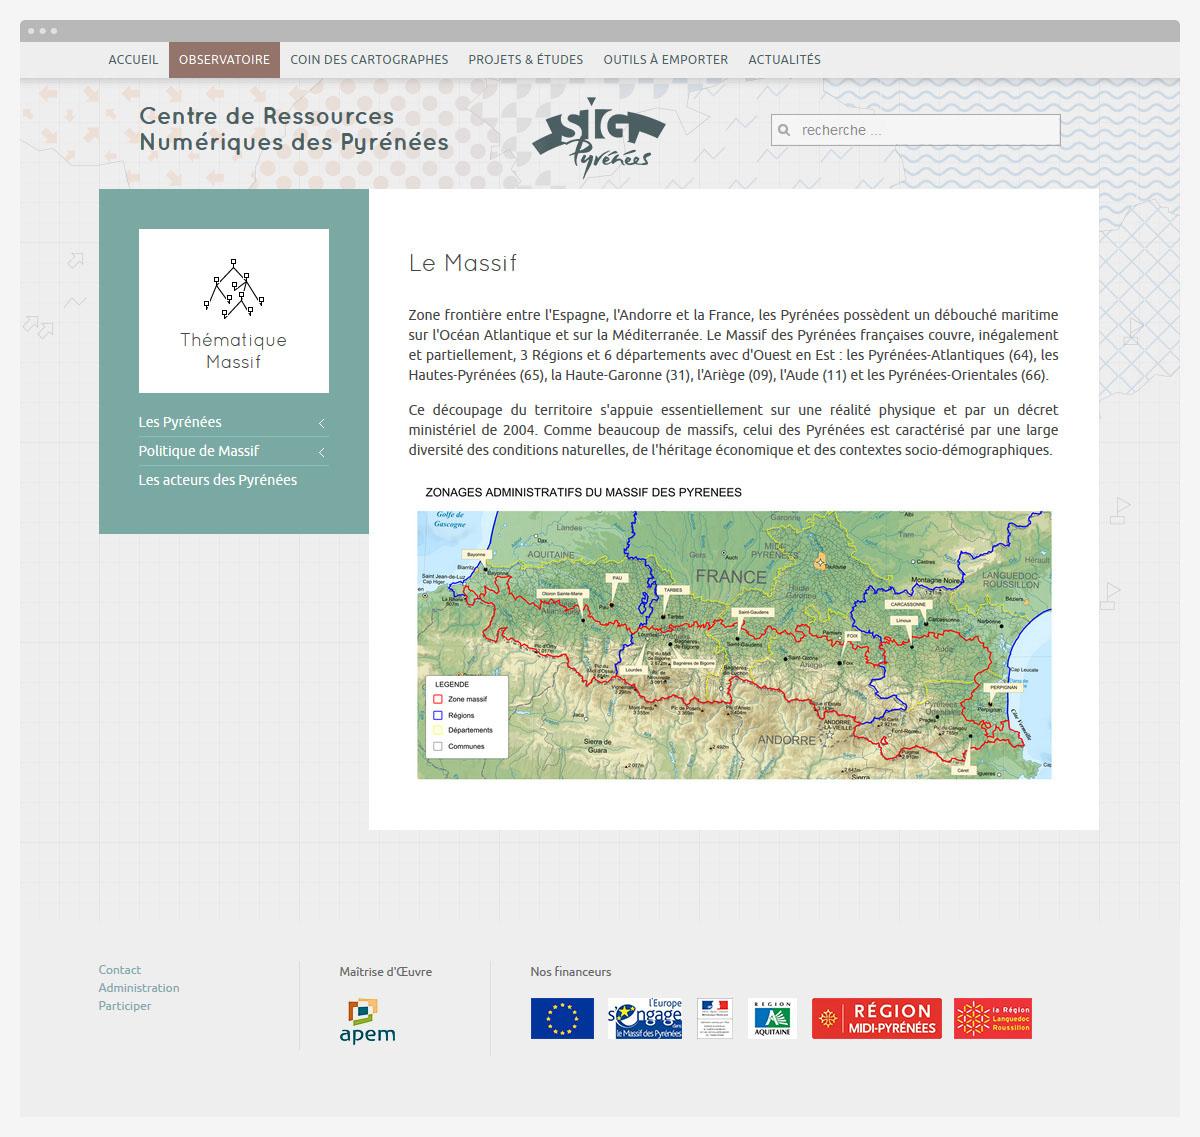 yves-saint-lary-sig-pyrenees-web-design-page